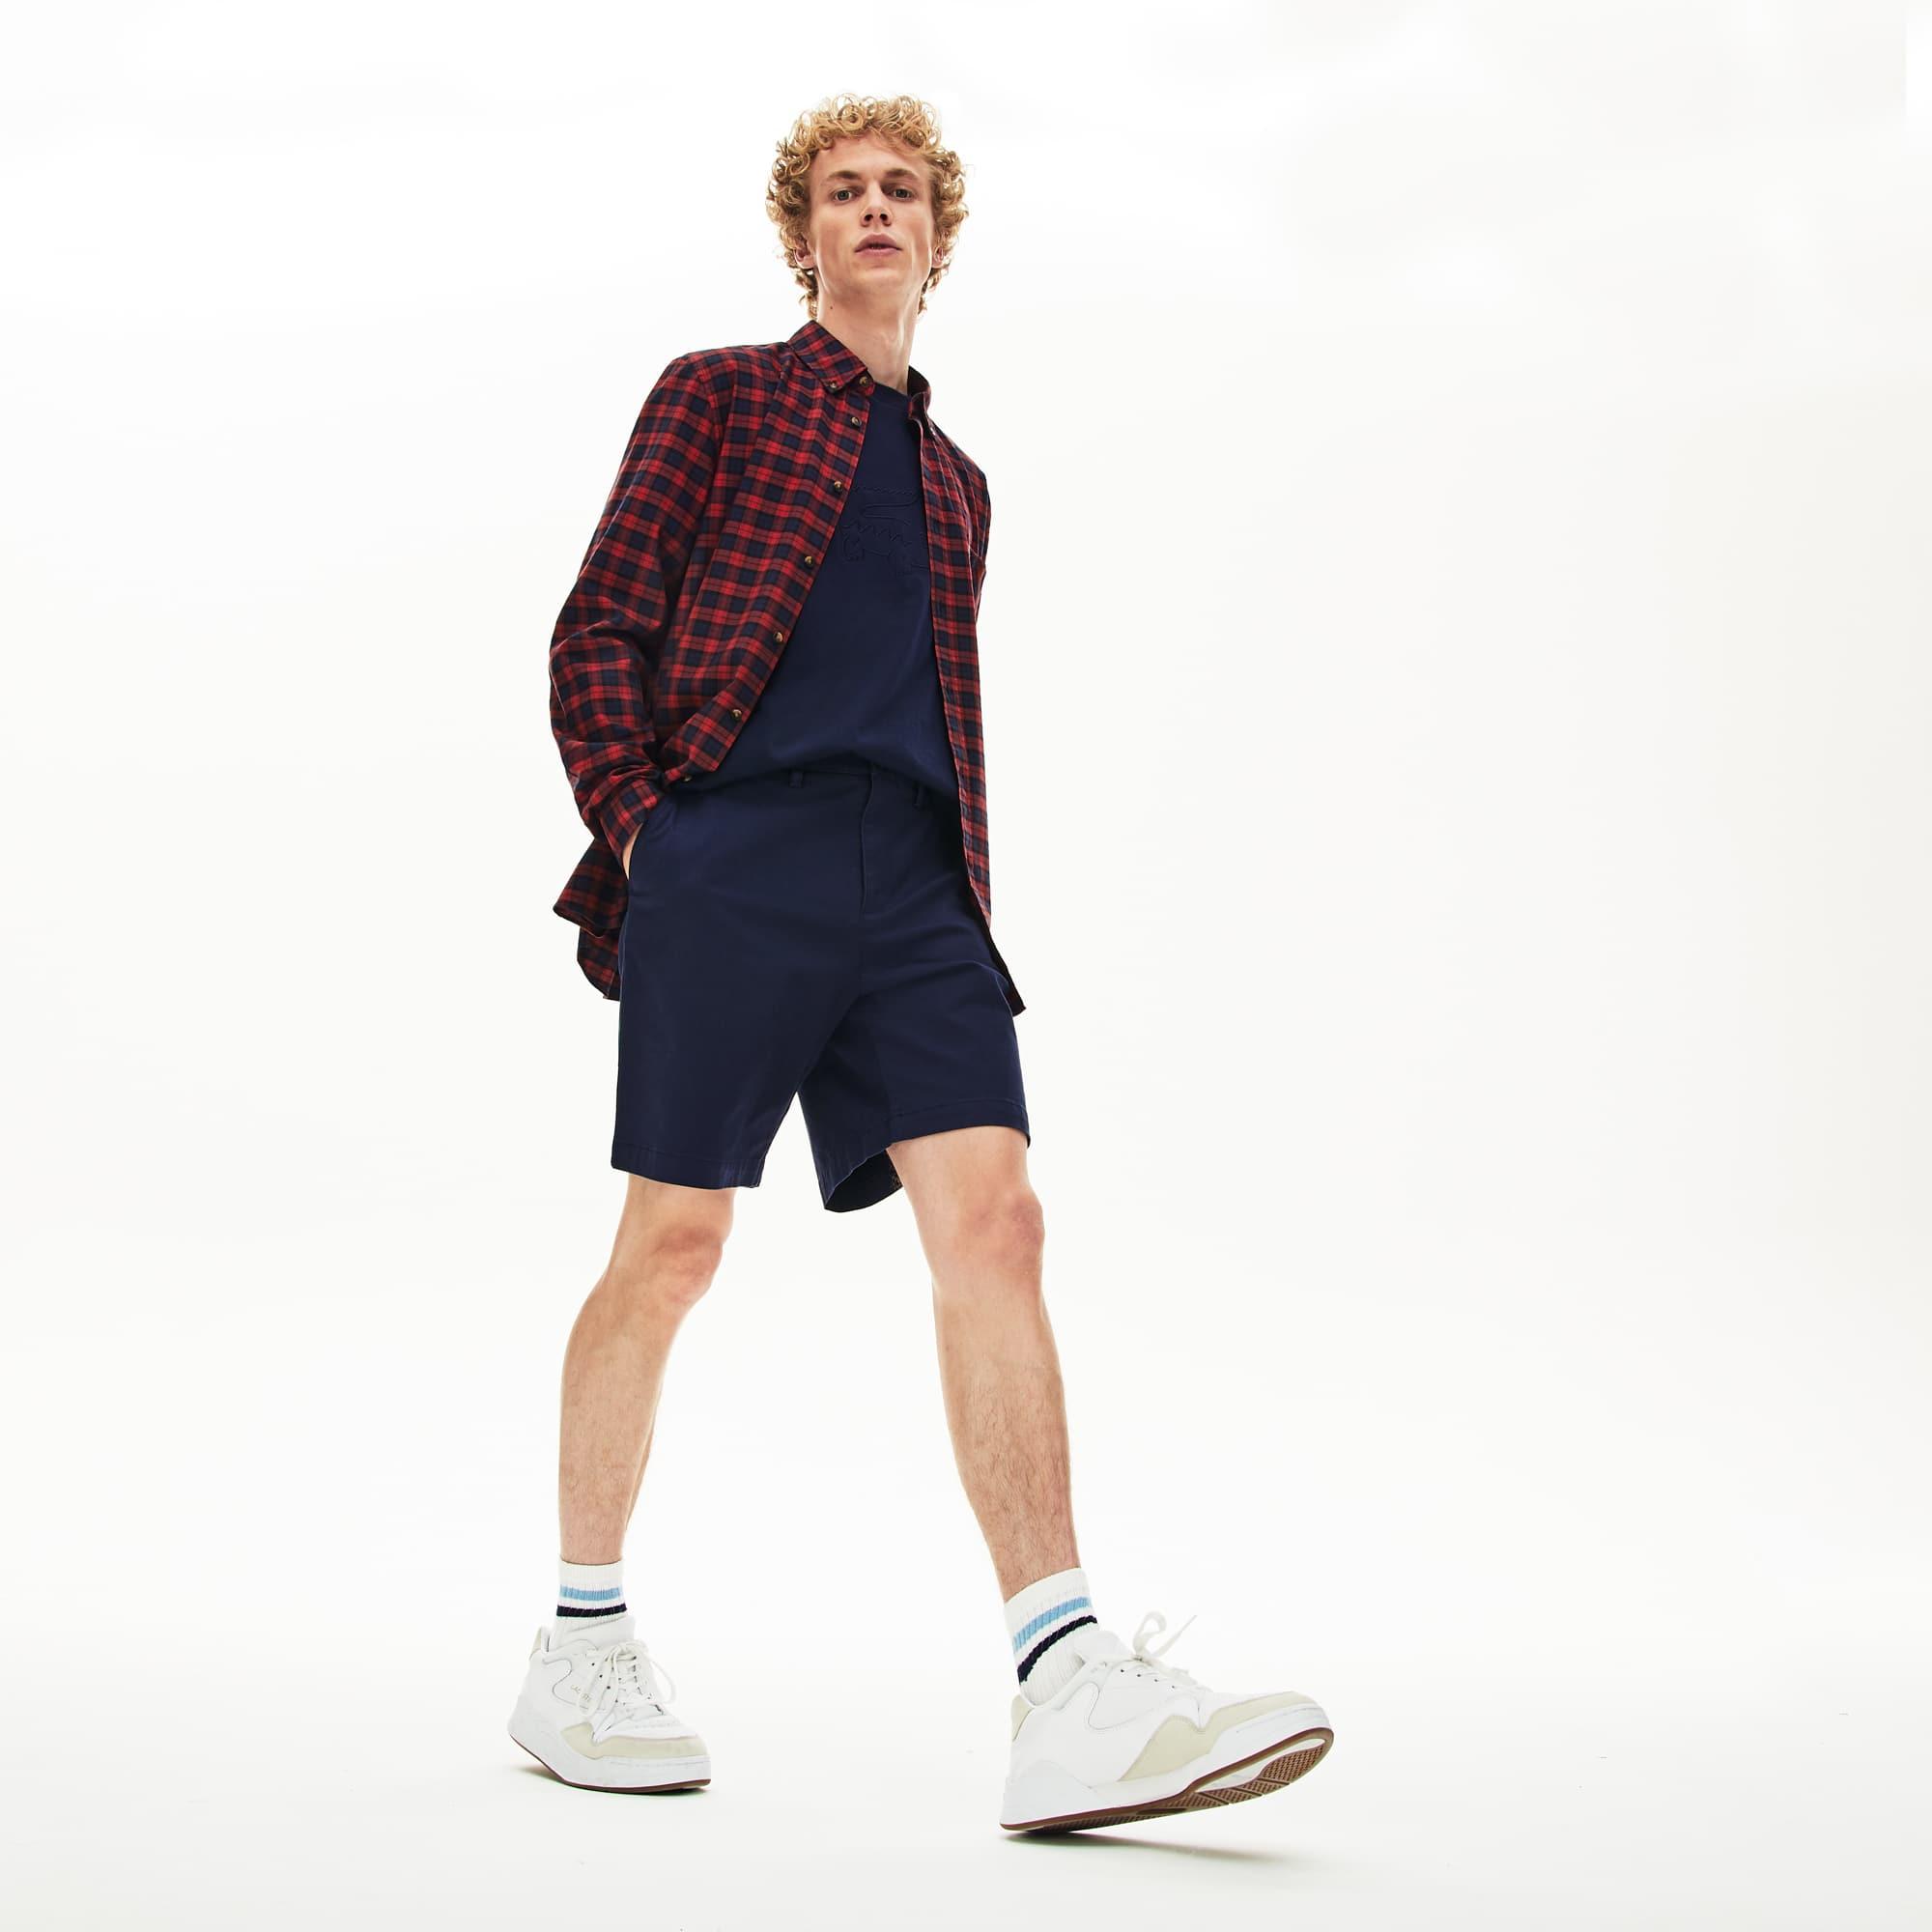 b36a6cde44b Men's Pants and Jeans | Men's Shorts | LACOSTE